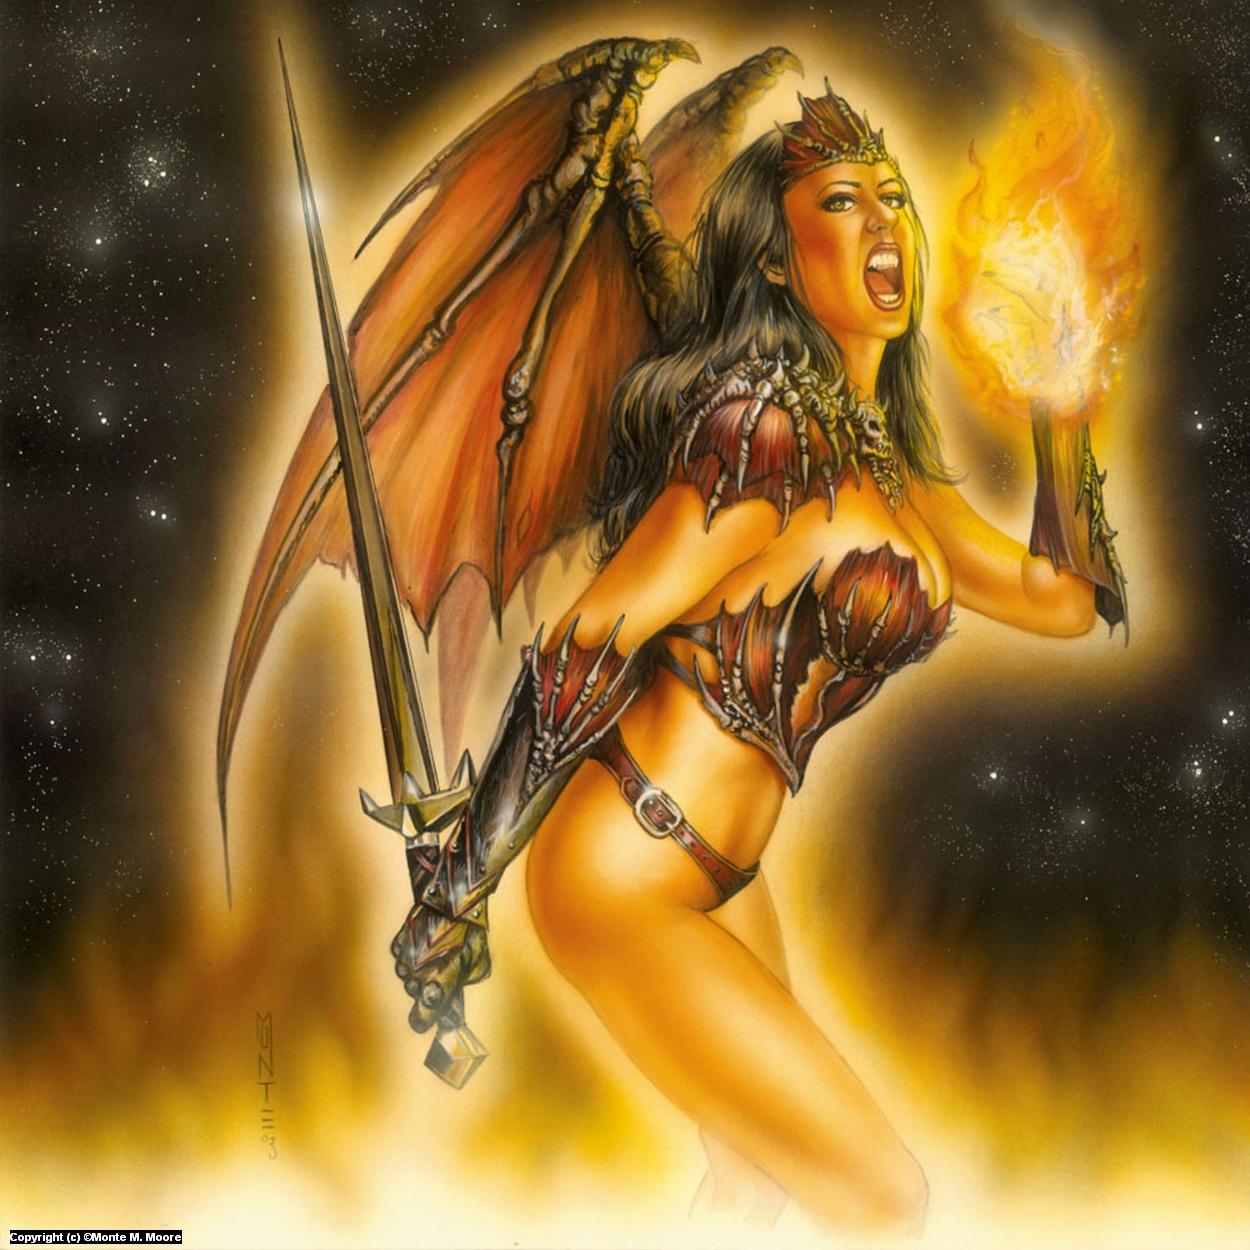 Knightfire Artwork by Monte Moore